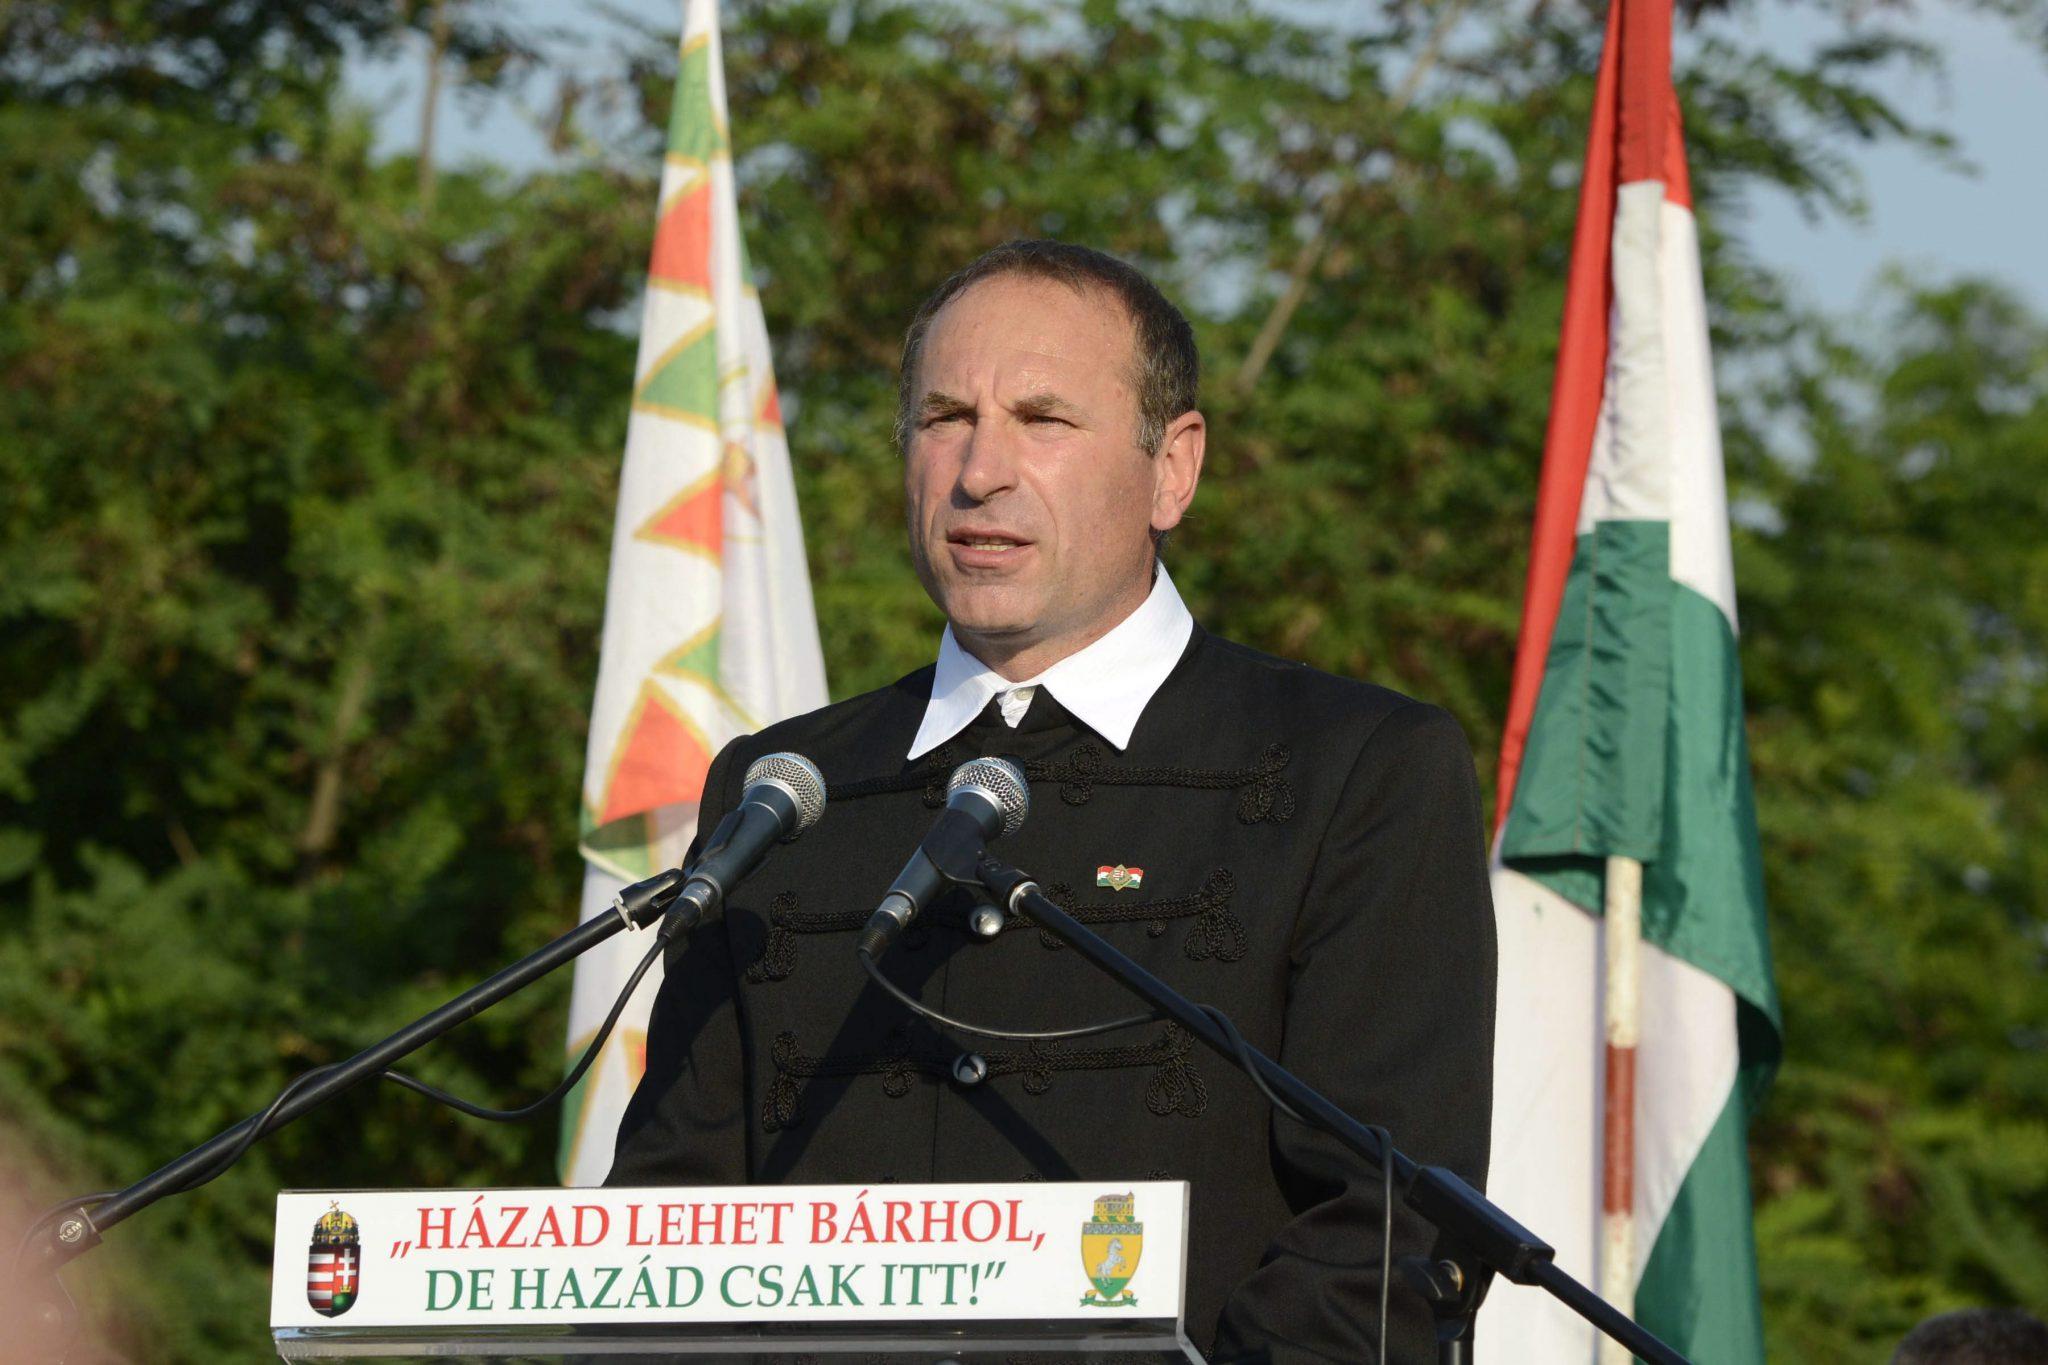 Fidesz MP Boldog Charged with Corruption